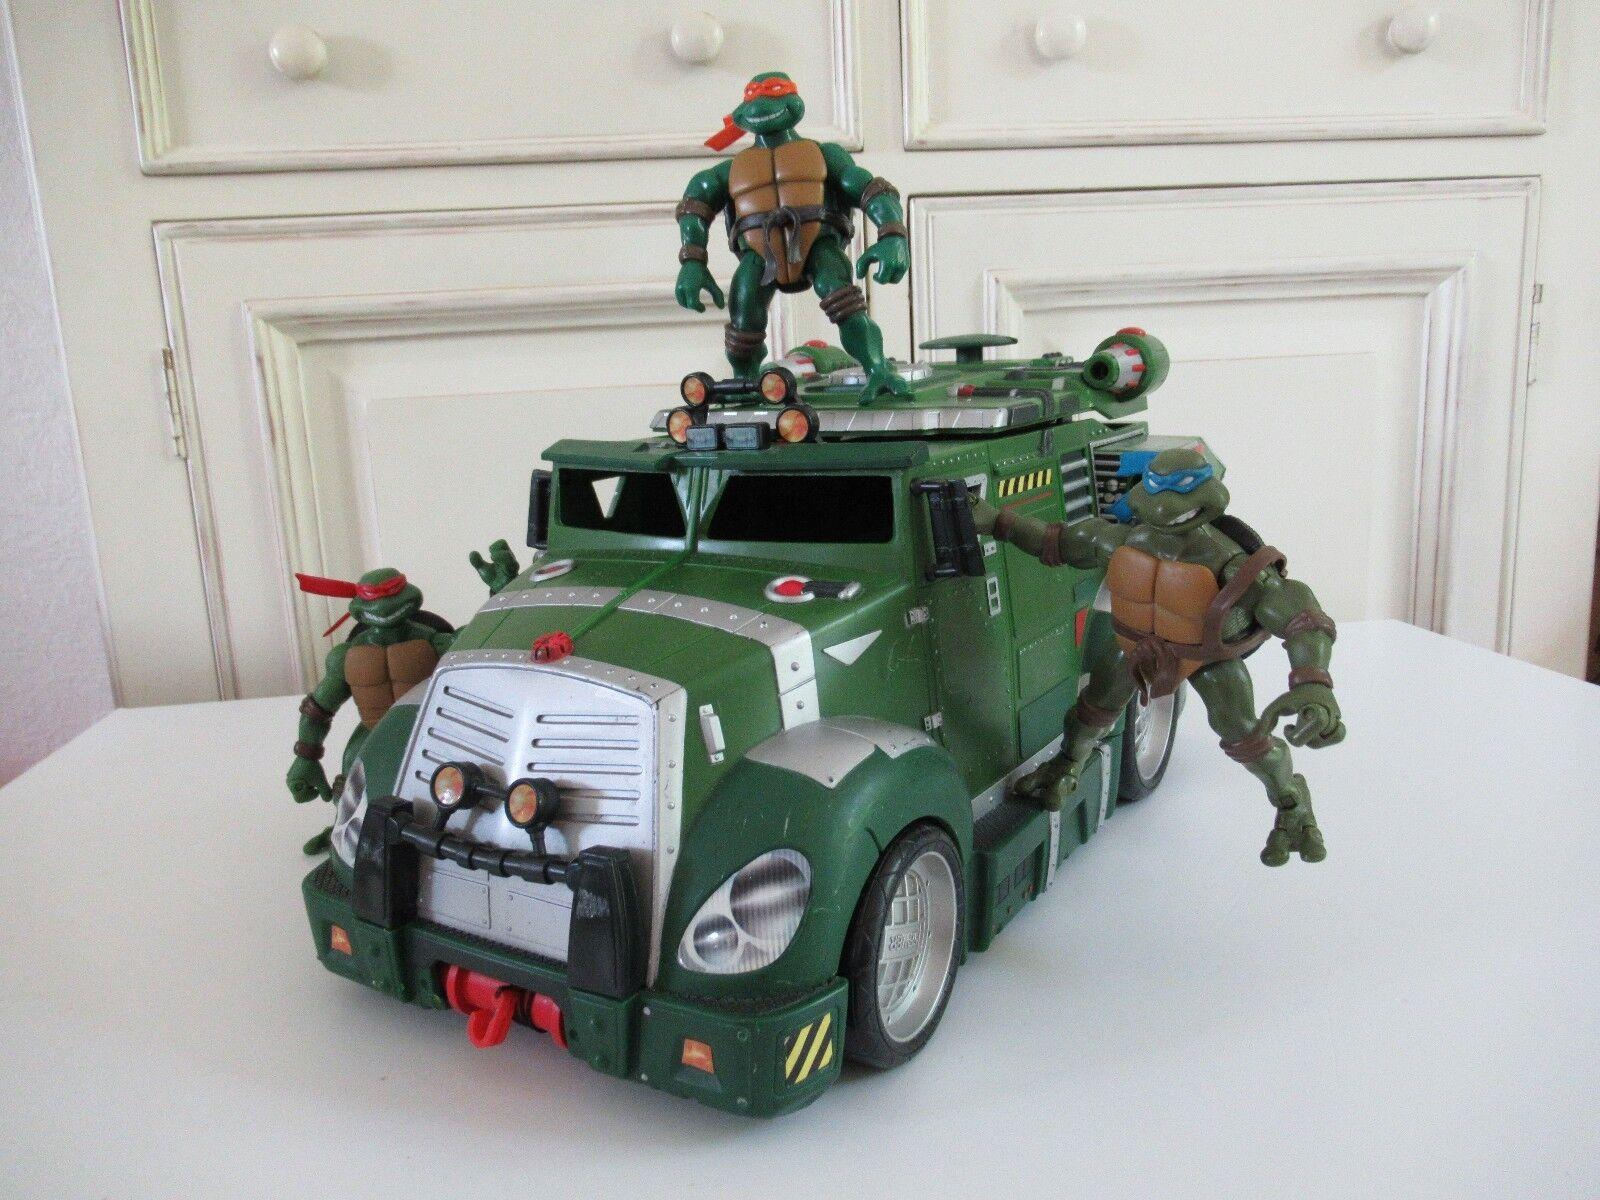 Jouet Camion Tortue Ninja Vendu Avec 3 Figurines